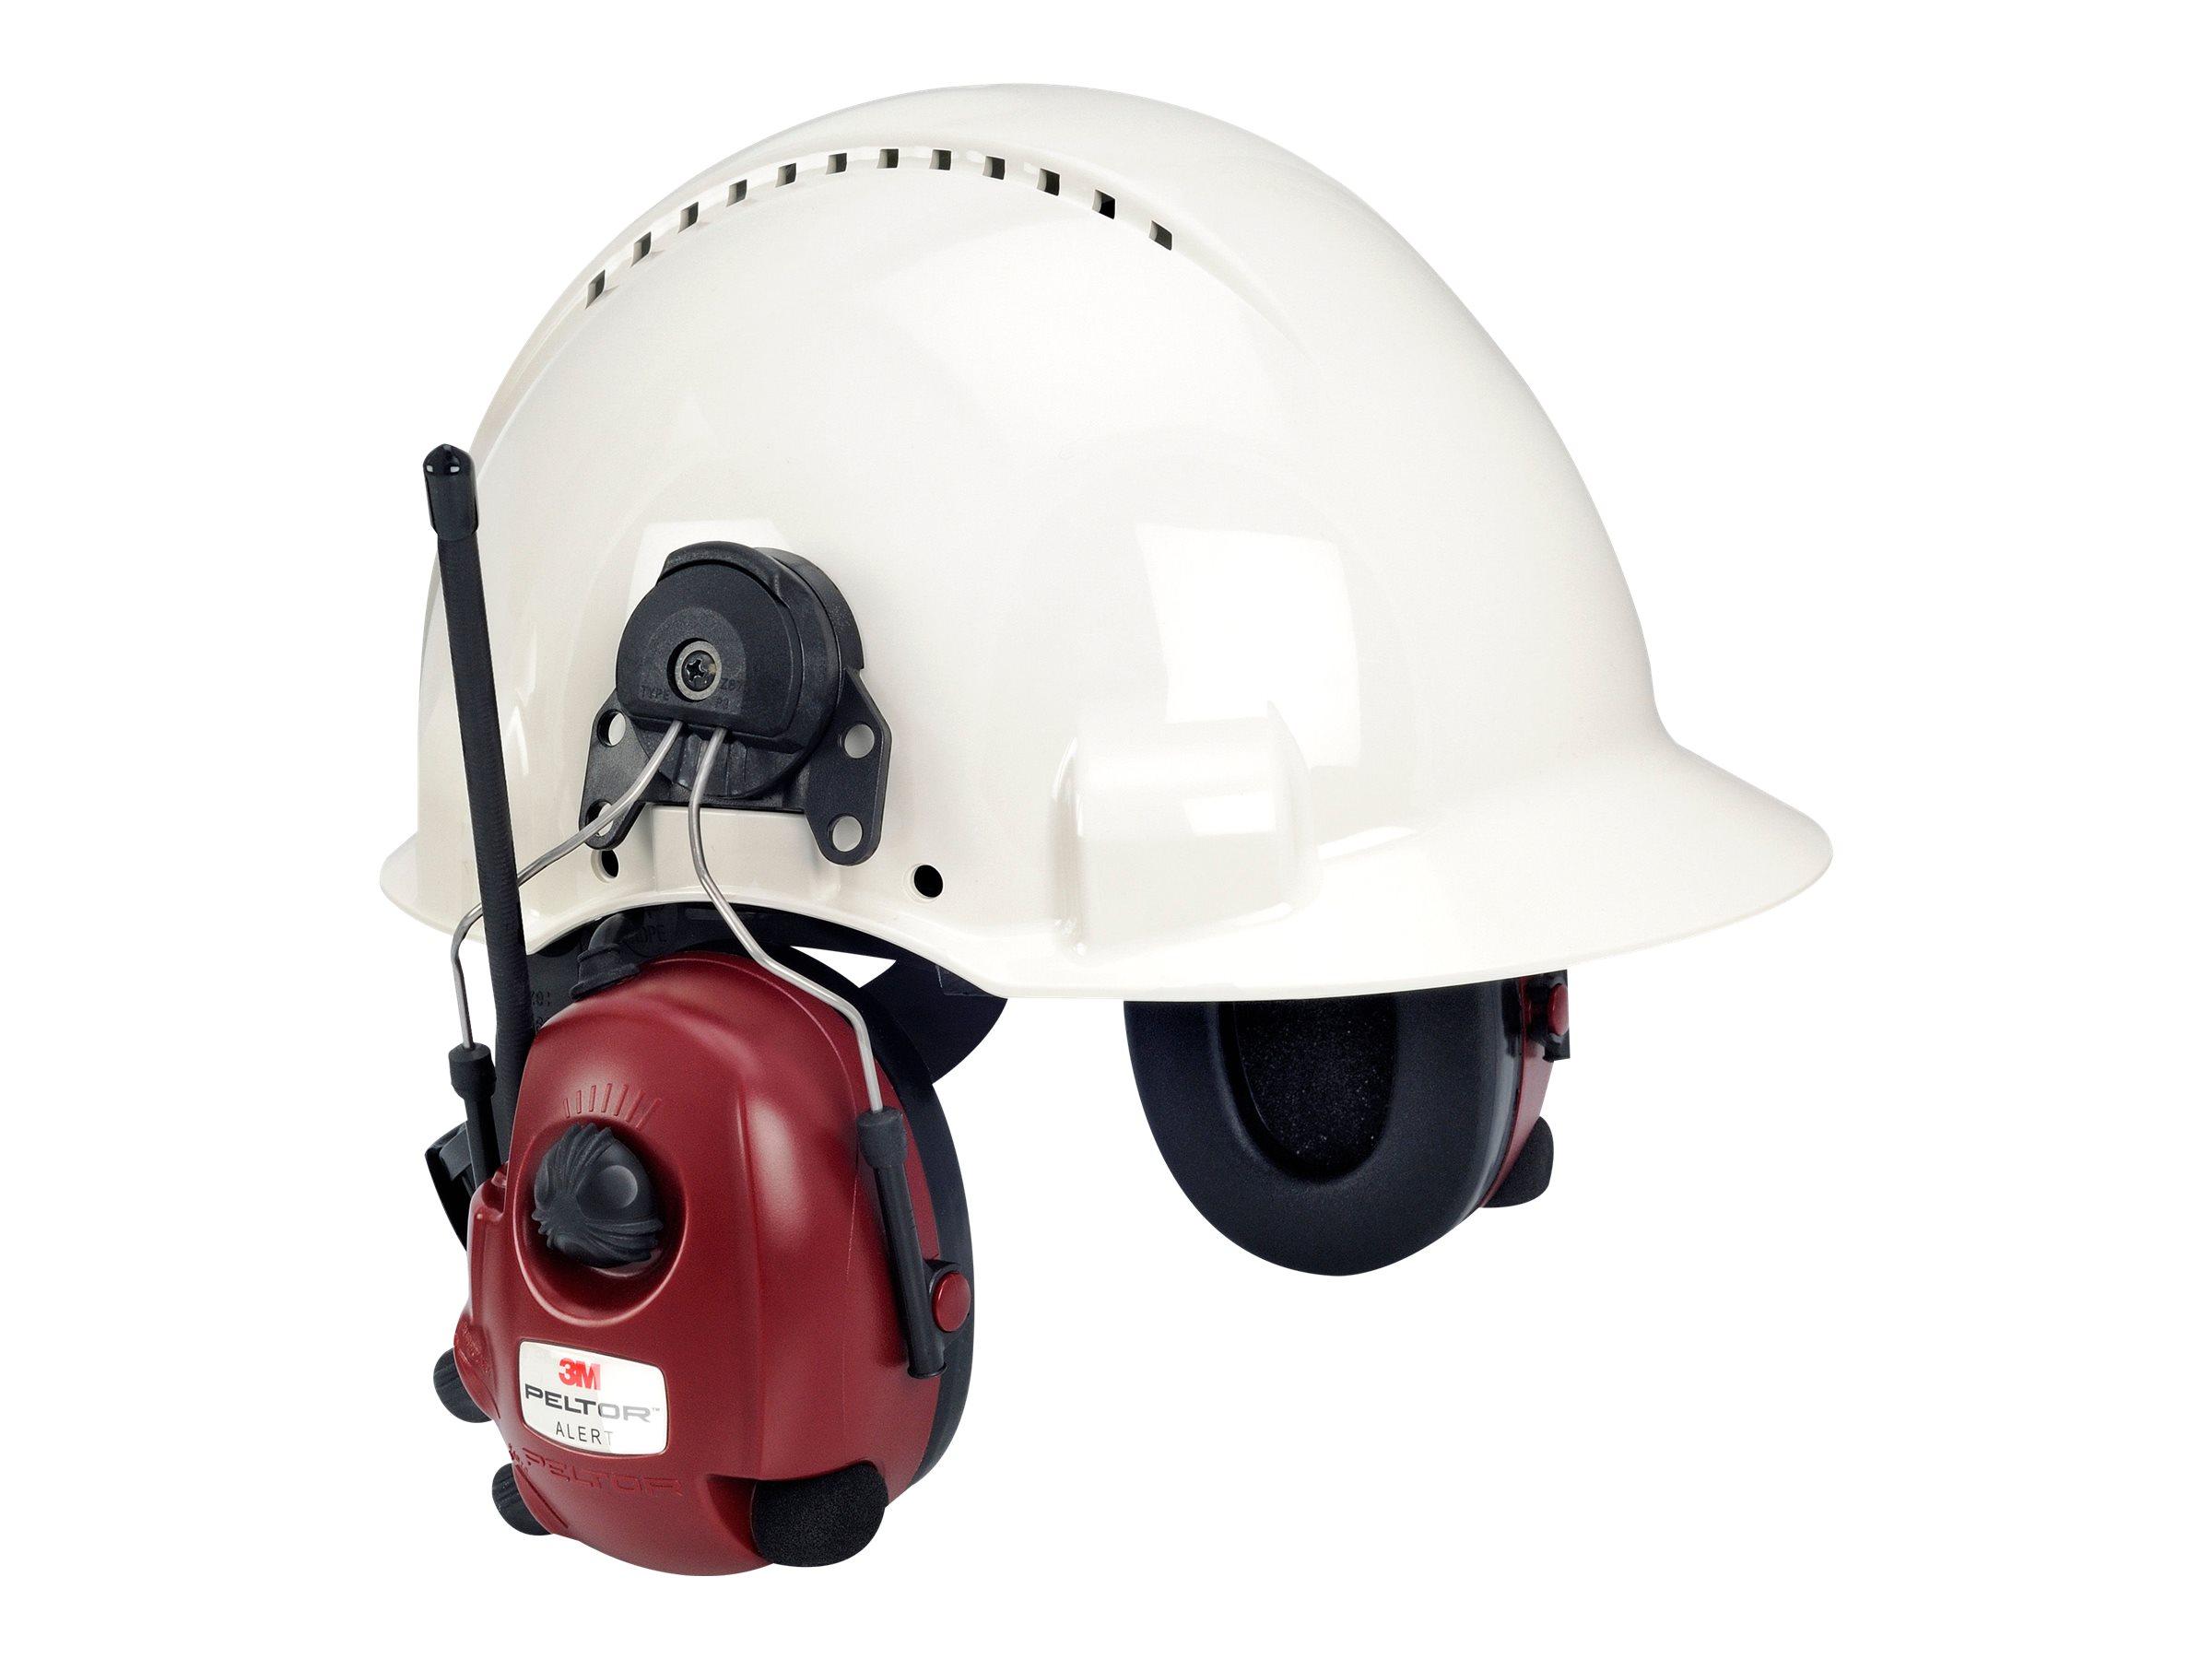 3M Peltor Alert M2RX7P3E2-01 - Headset mit Radio - am Helm angebracht - kabelgebunden - 3,5 mm Stecker - Rot